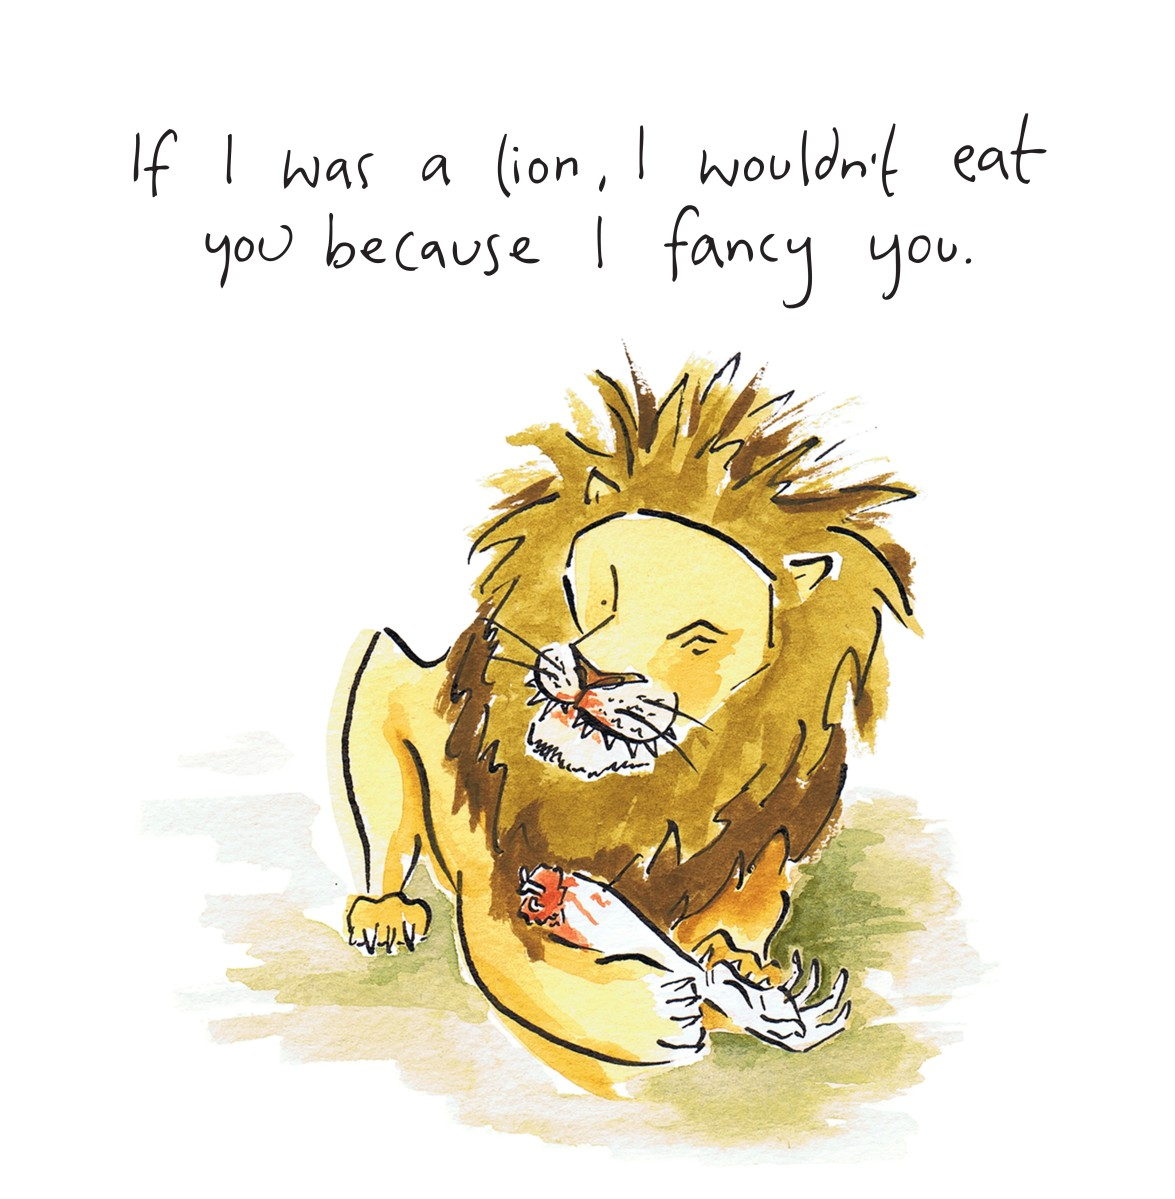 watercolour image of a lion, alternative valentine image